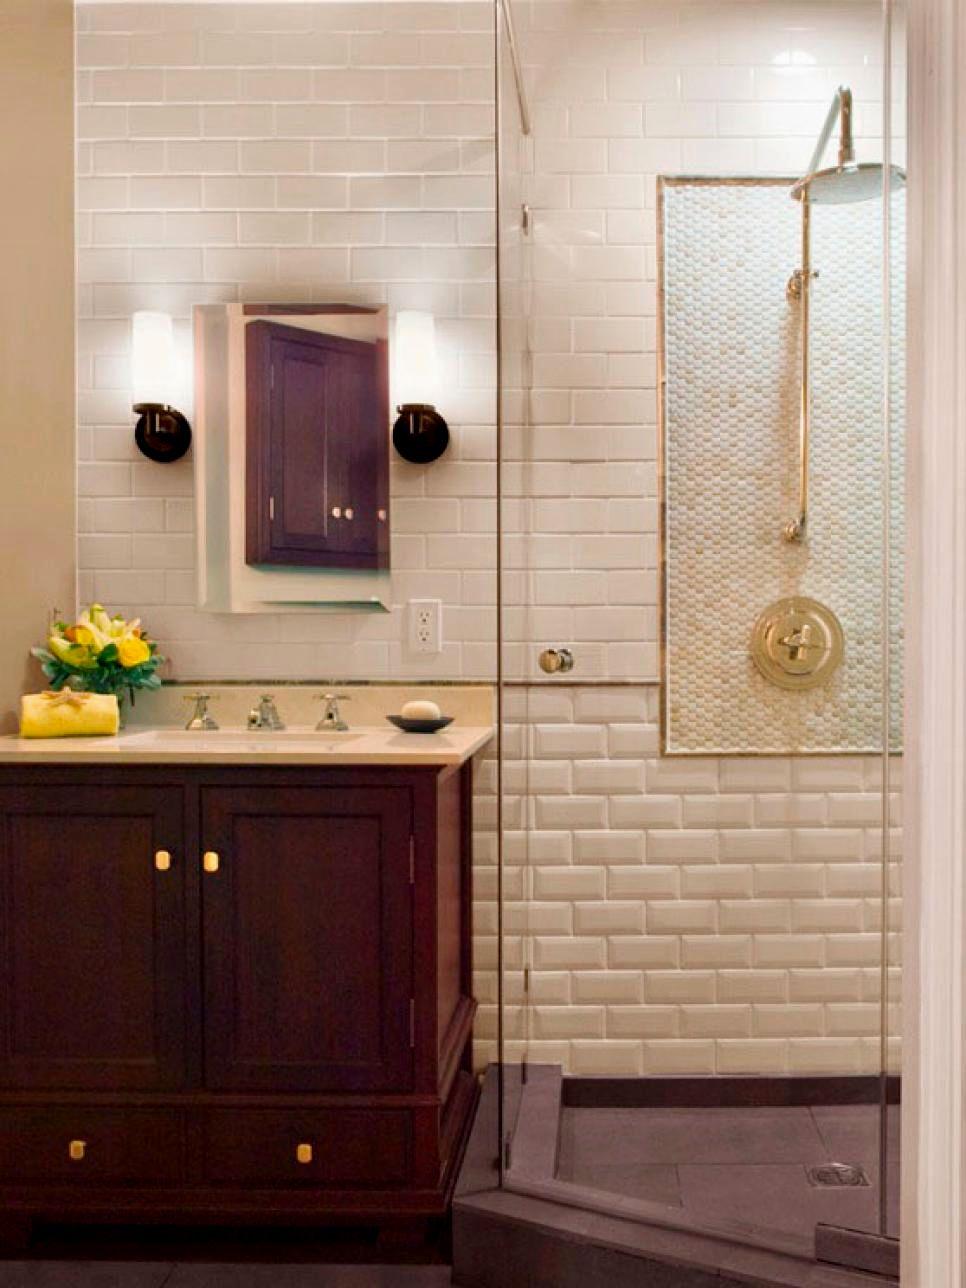 luxury kids bathroom ideas layout-Excellent Kids Bathroom Ideas Inspiration